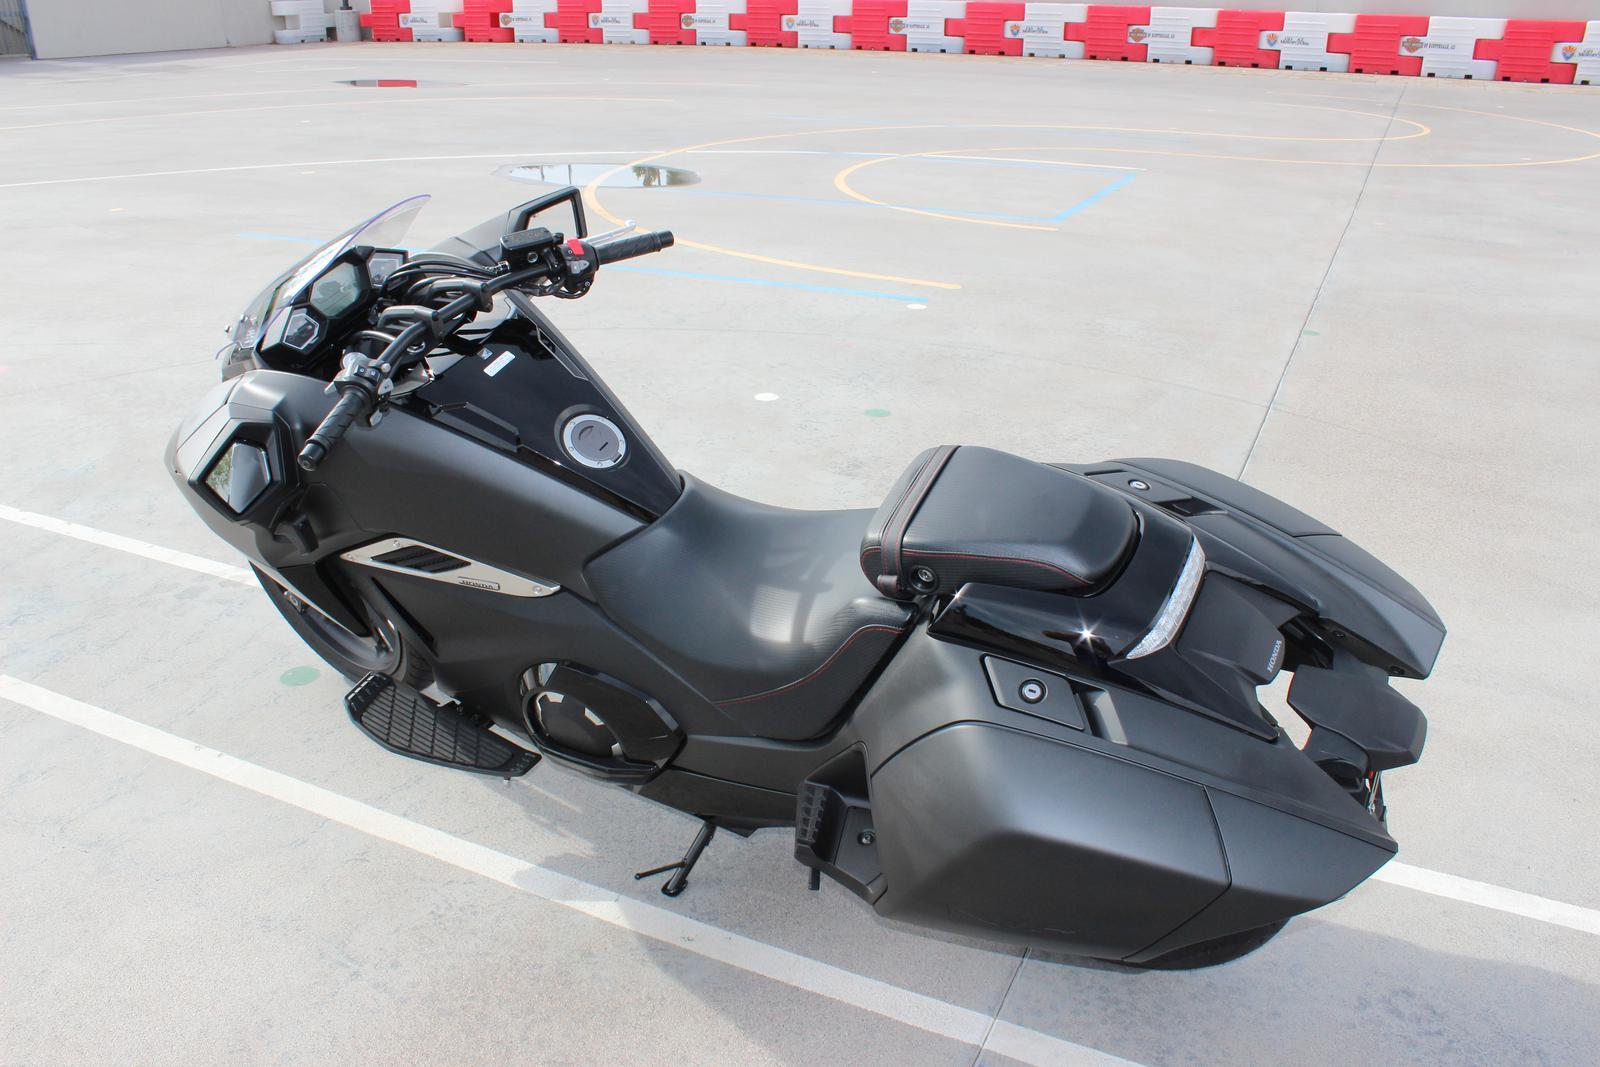 2018 honda nm4 for sale in scottsdale, az | go az motorcycles (480